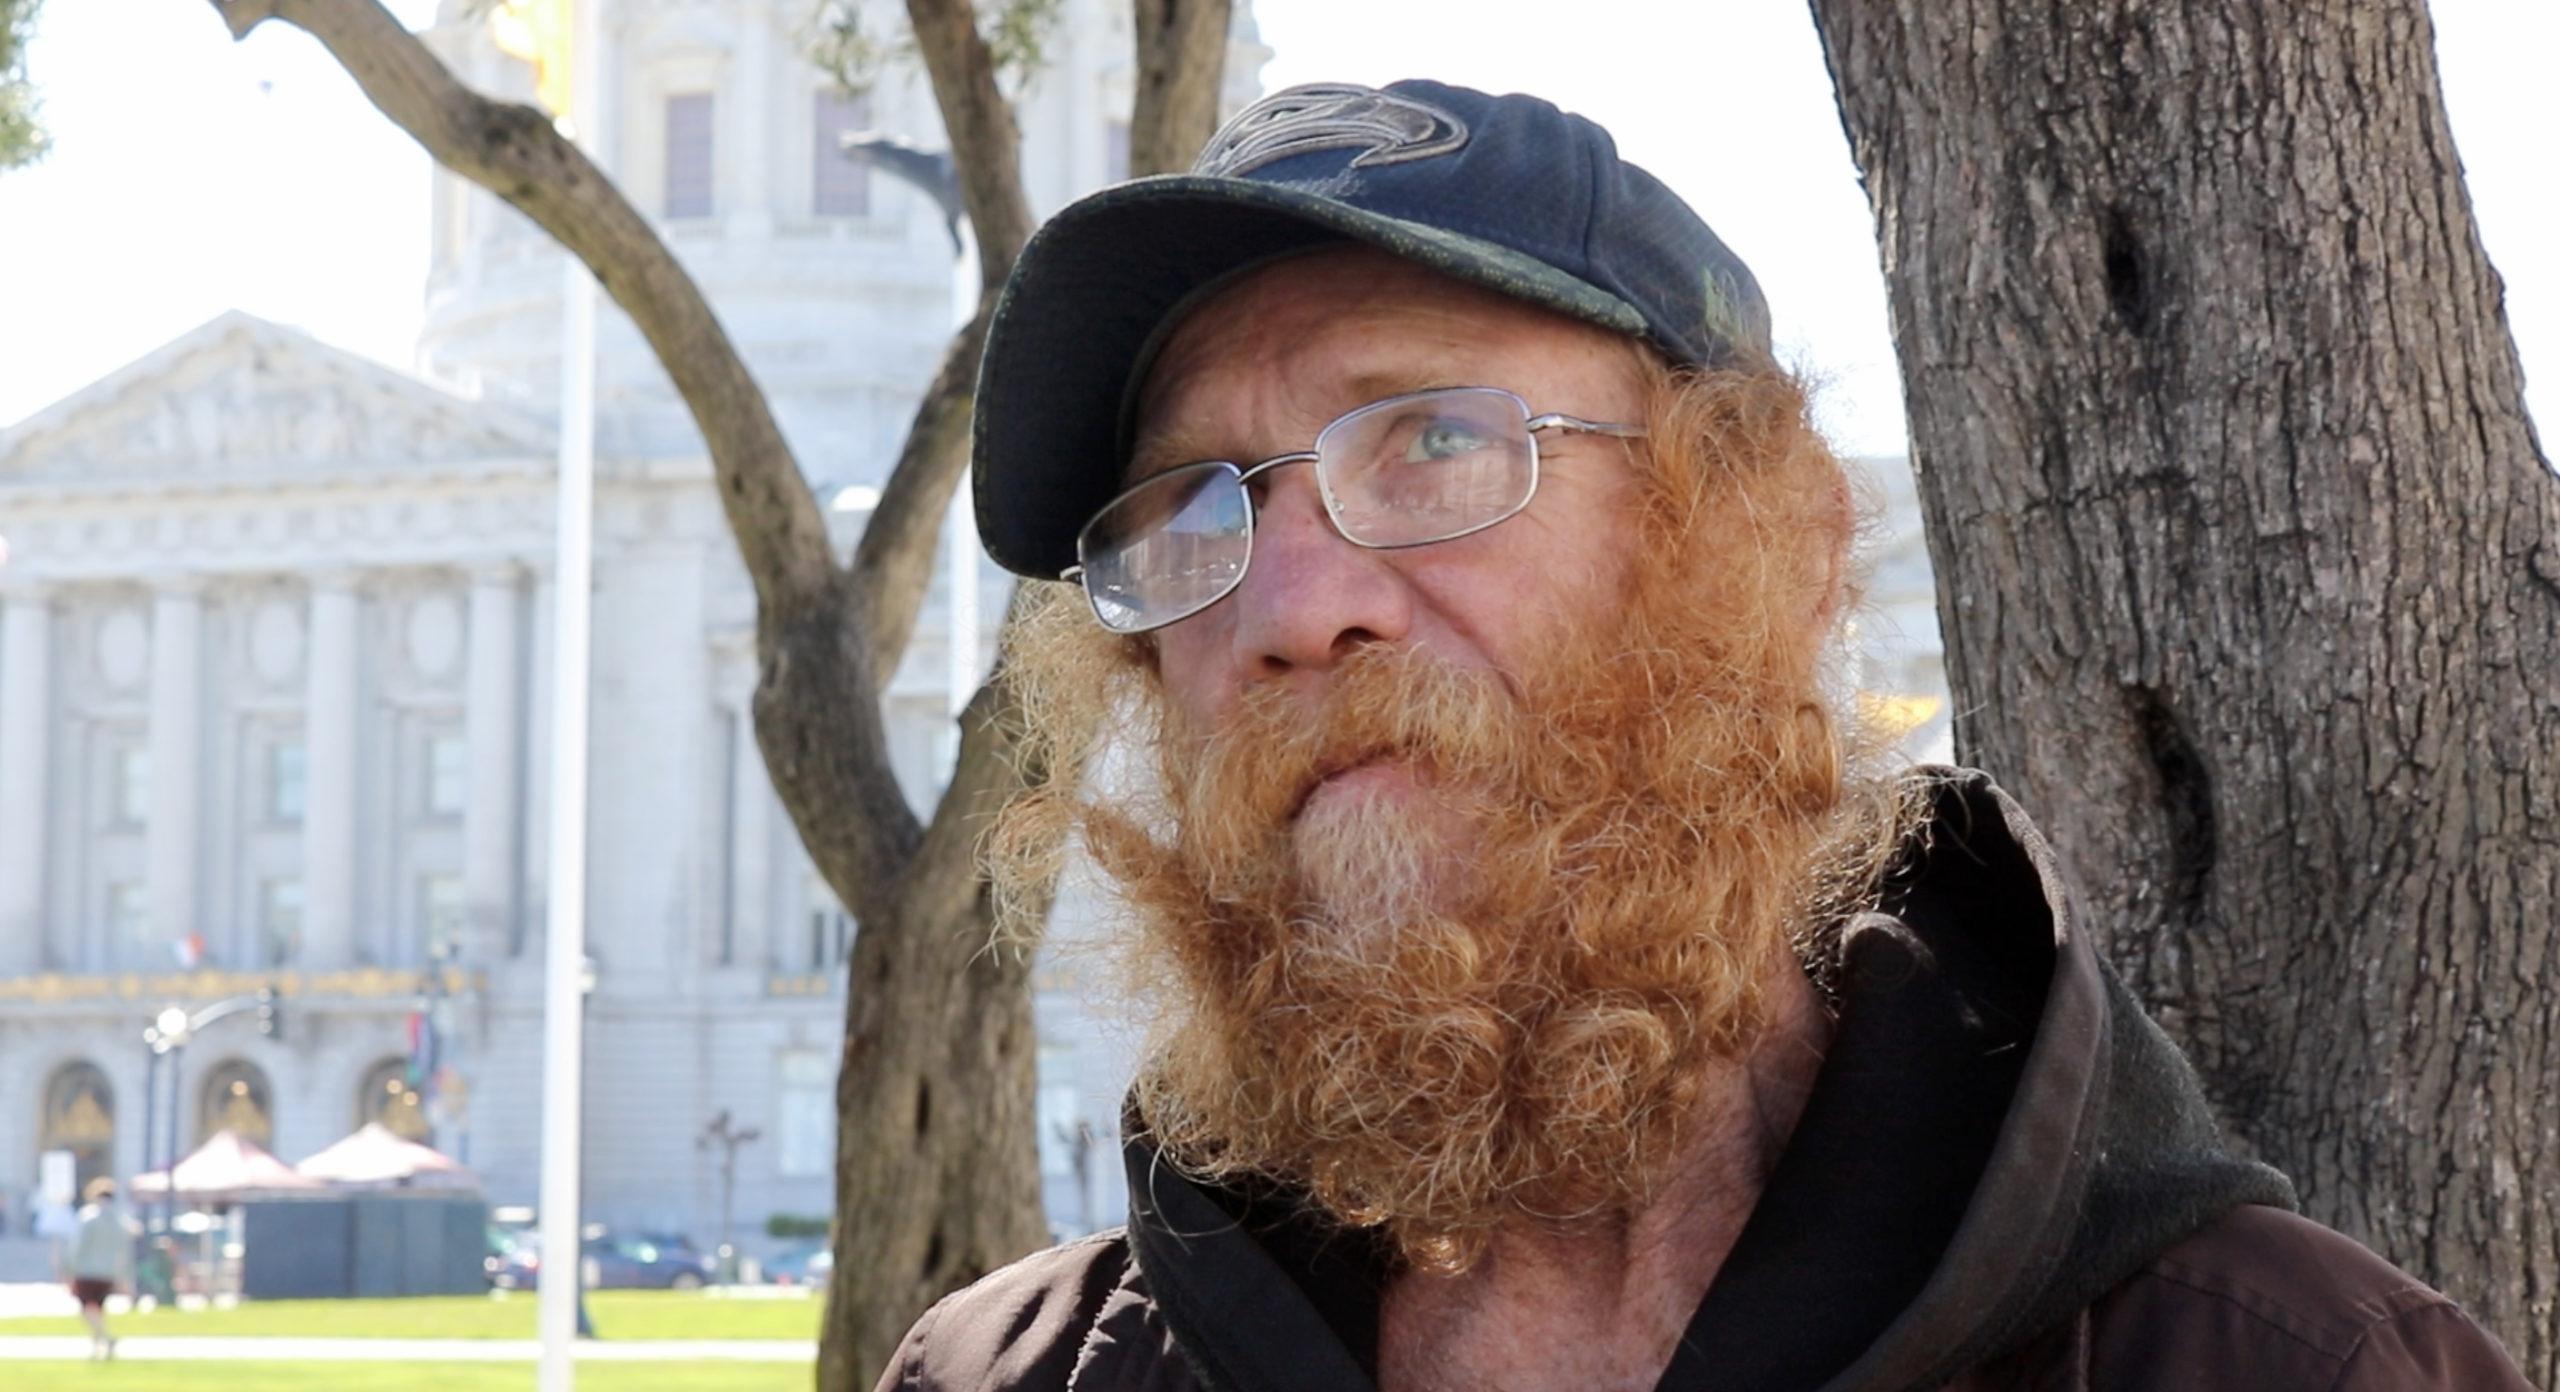 Charles Davis with a baseball cap, glasses, and a bushy red beard.